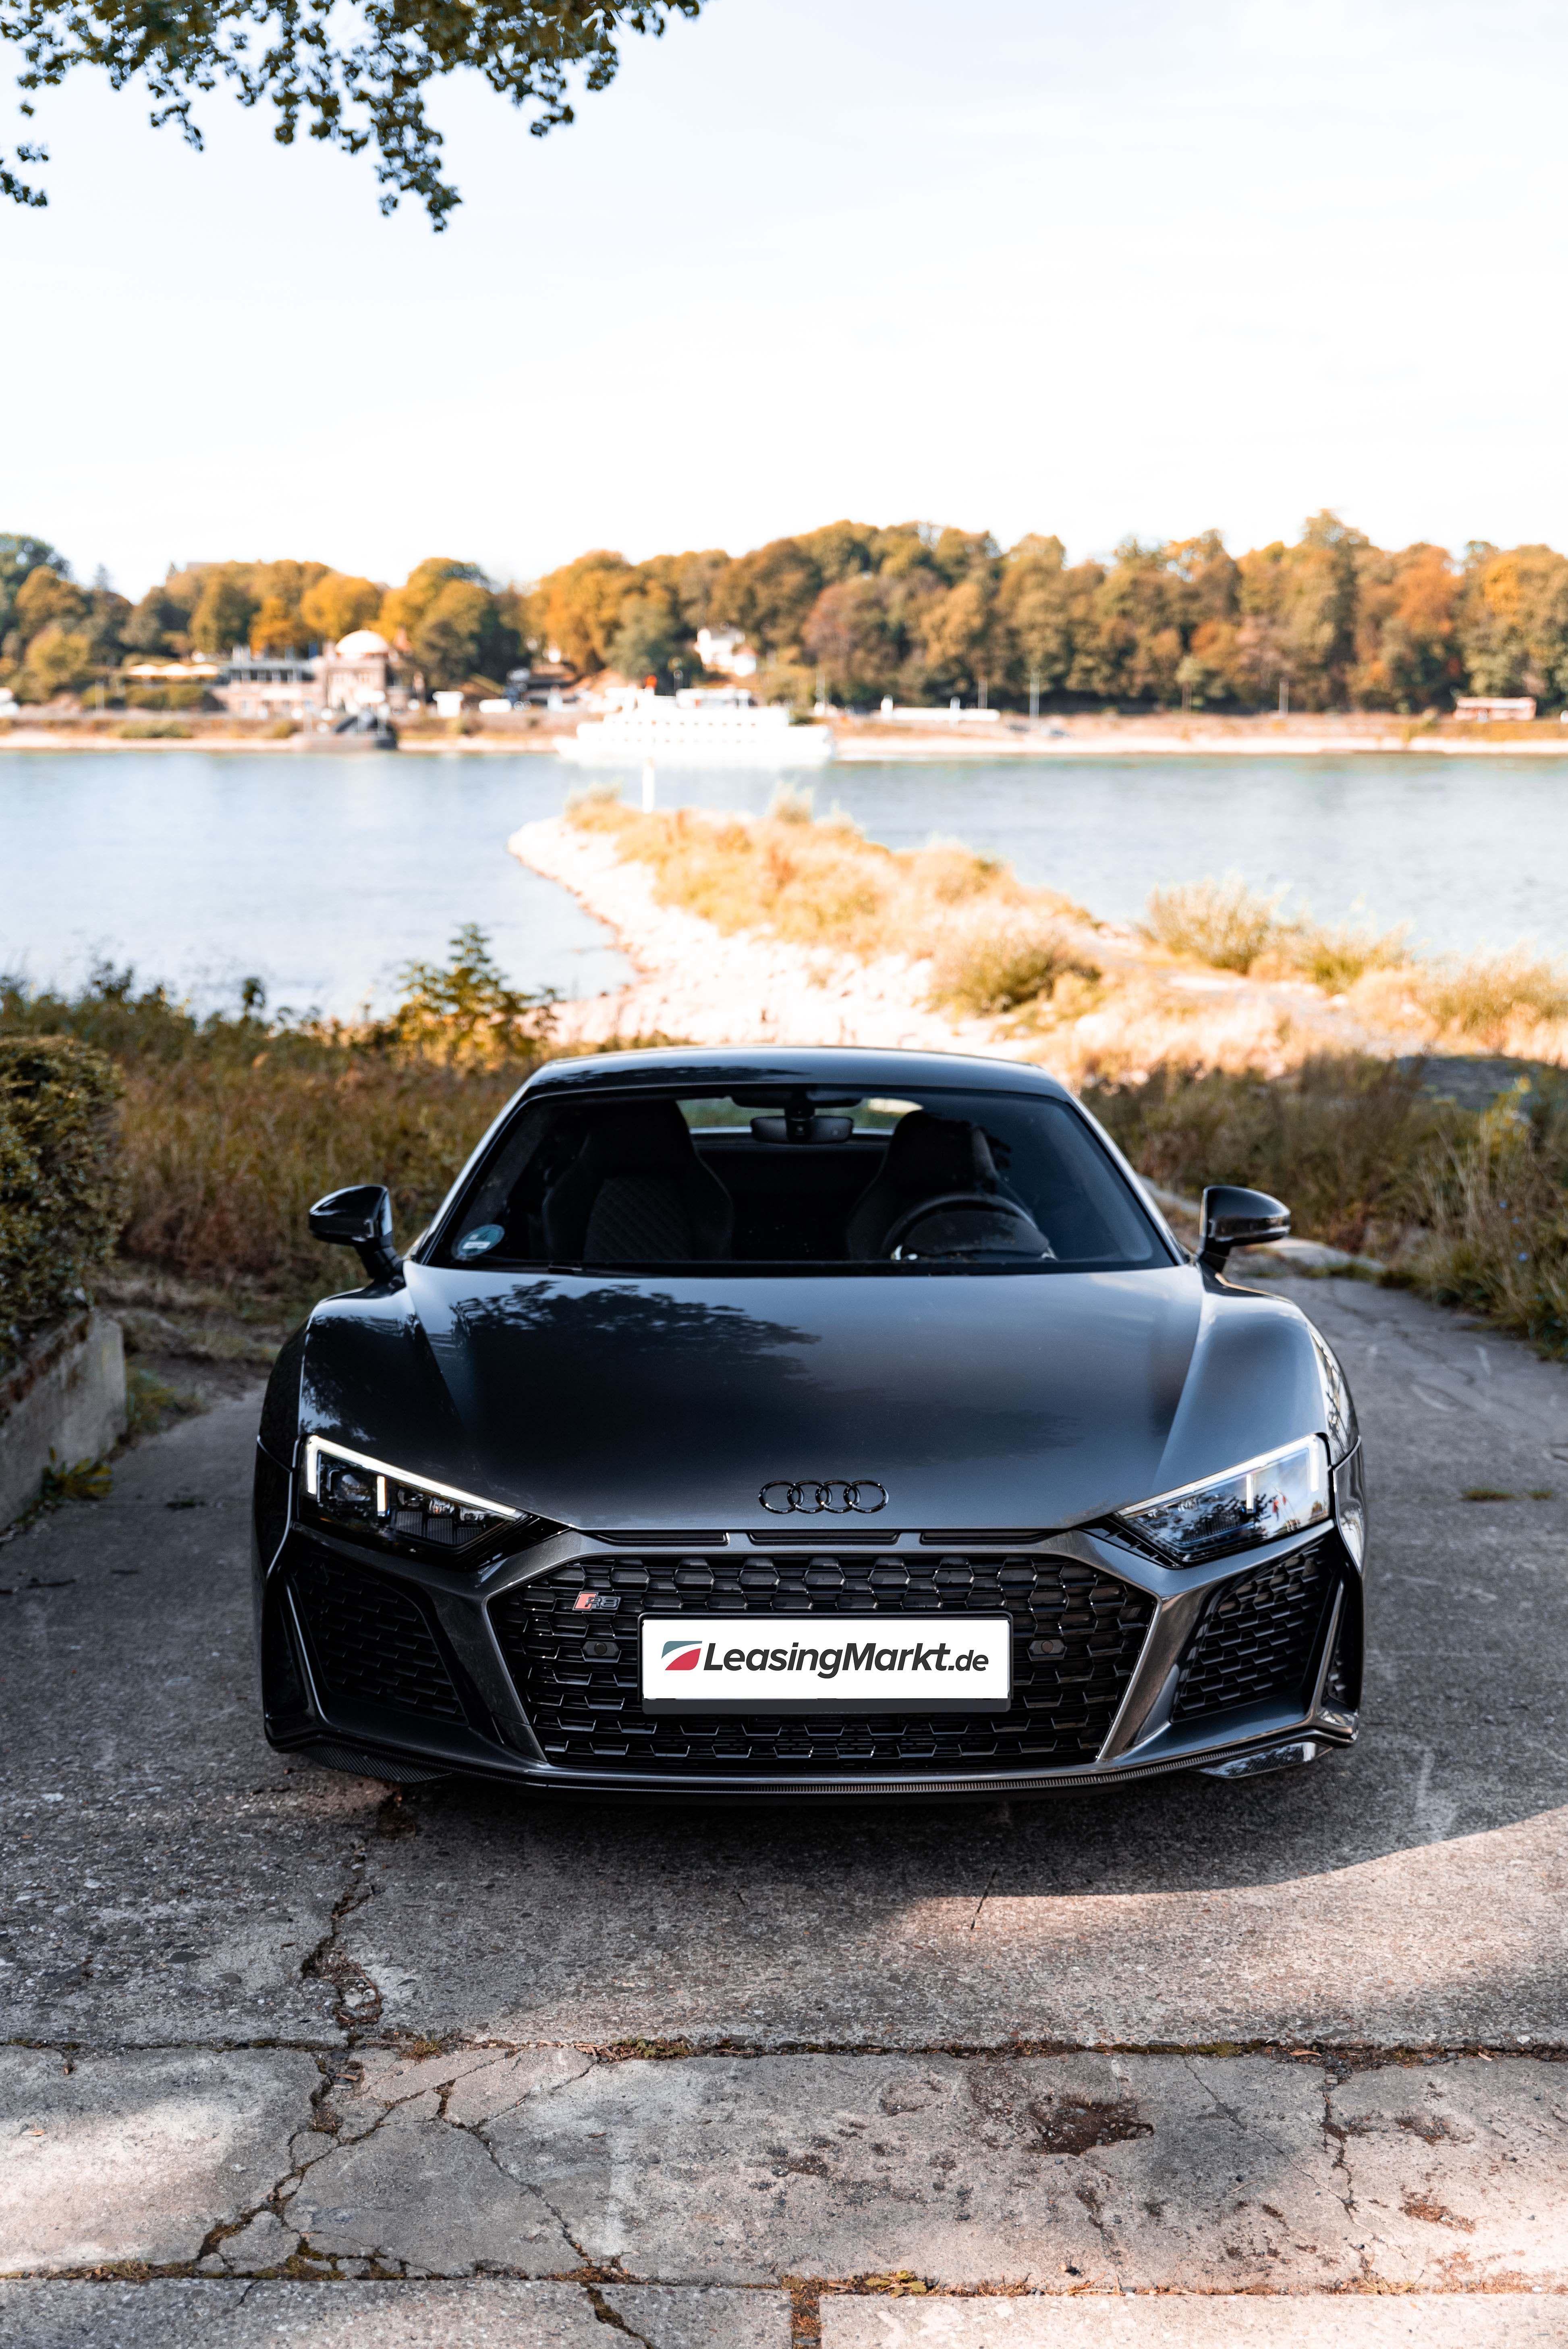 Audi R8 In 2020 Auto Leasing Audi R8 Audi